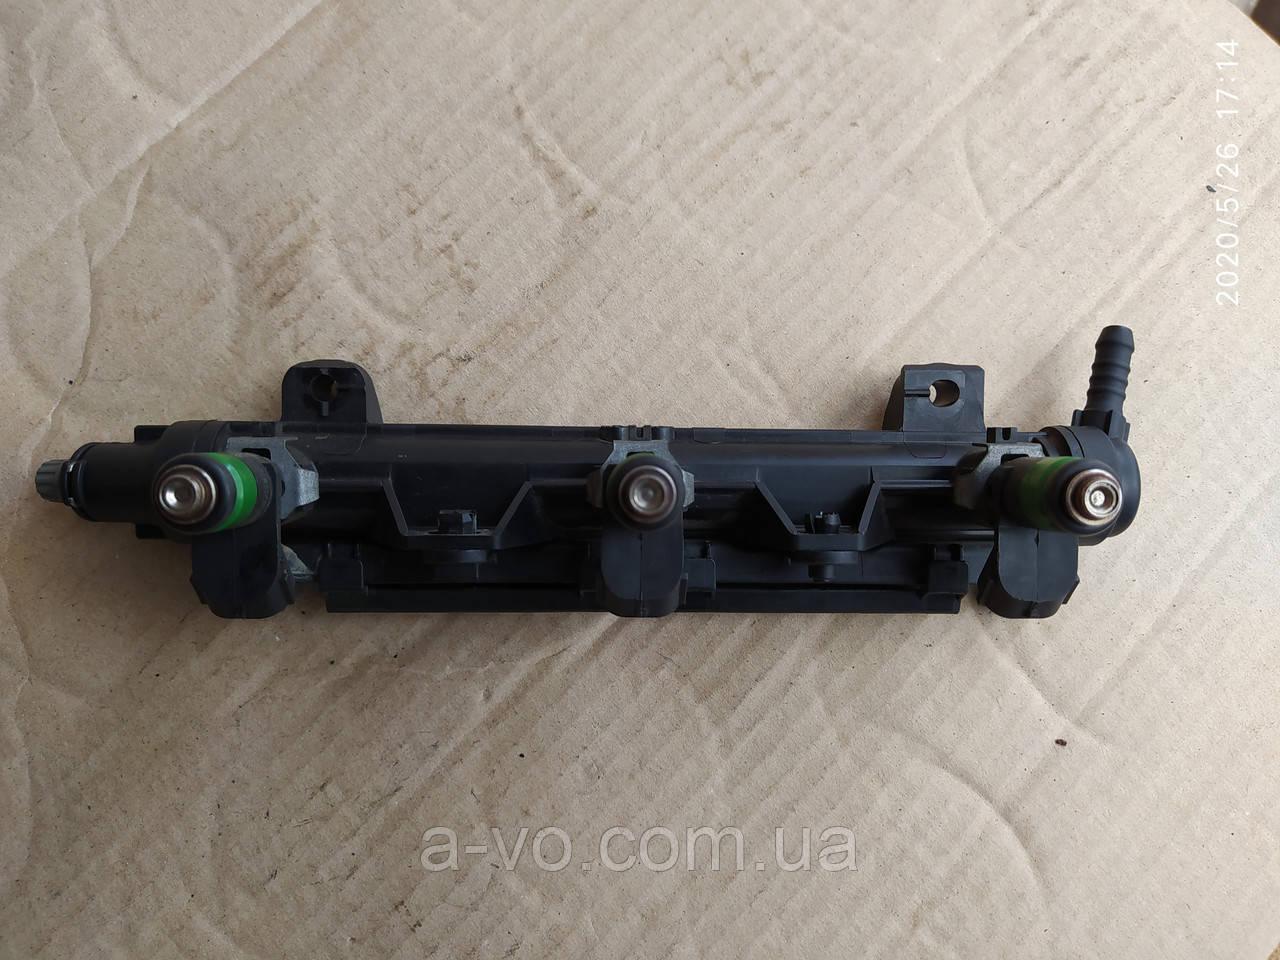 Топливная рейка Skoda Fabia 1-2  VW Polo 1.2  03e133320a